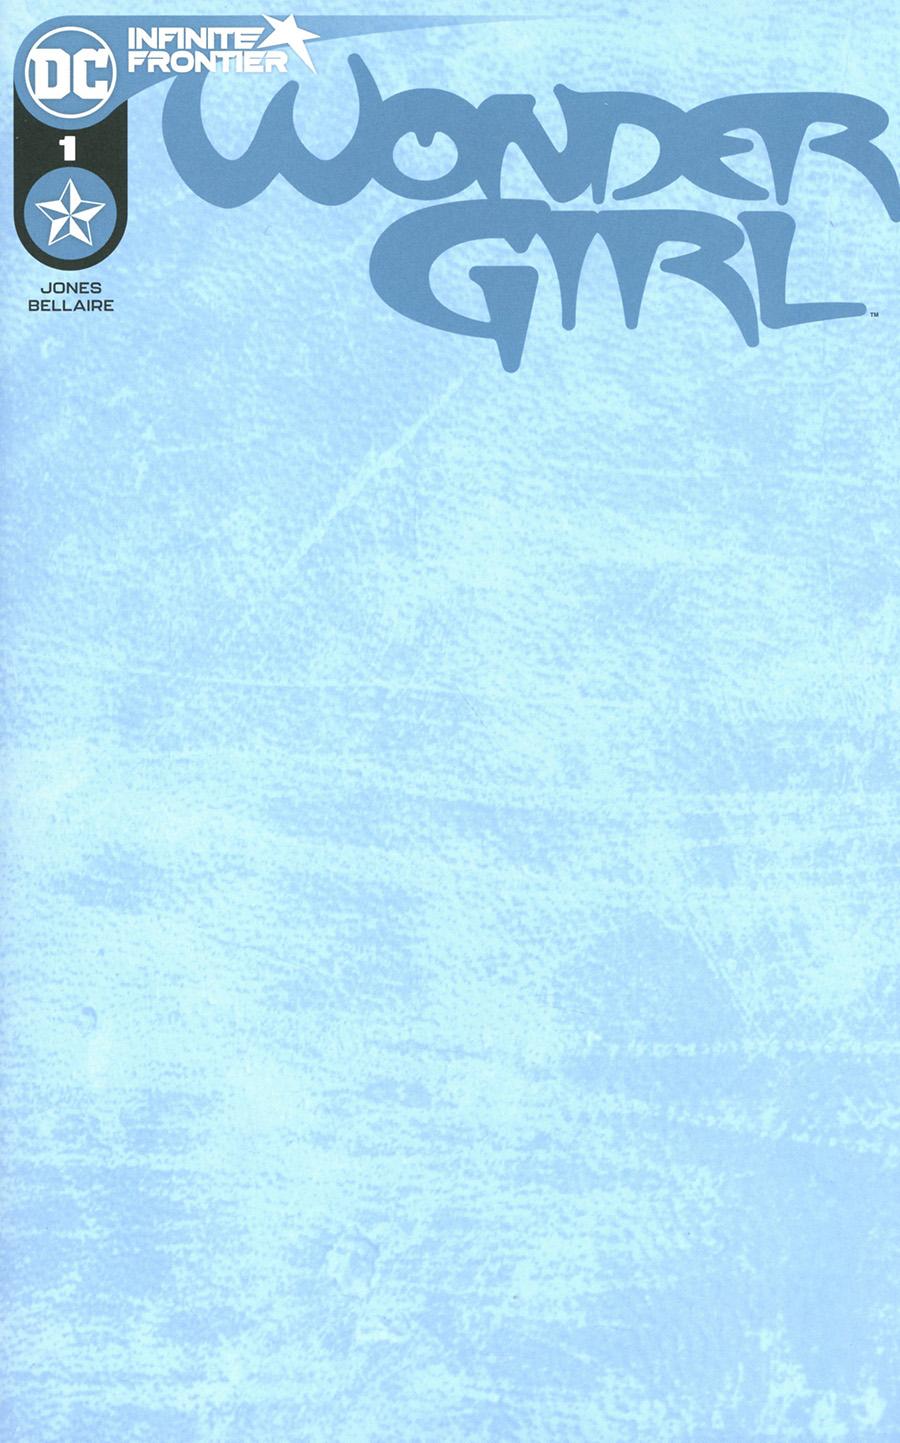 Wonder Girl Vol 2 #1 Cover C Variant Blank Card Stock Cover